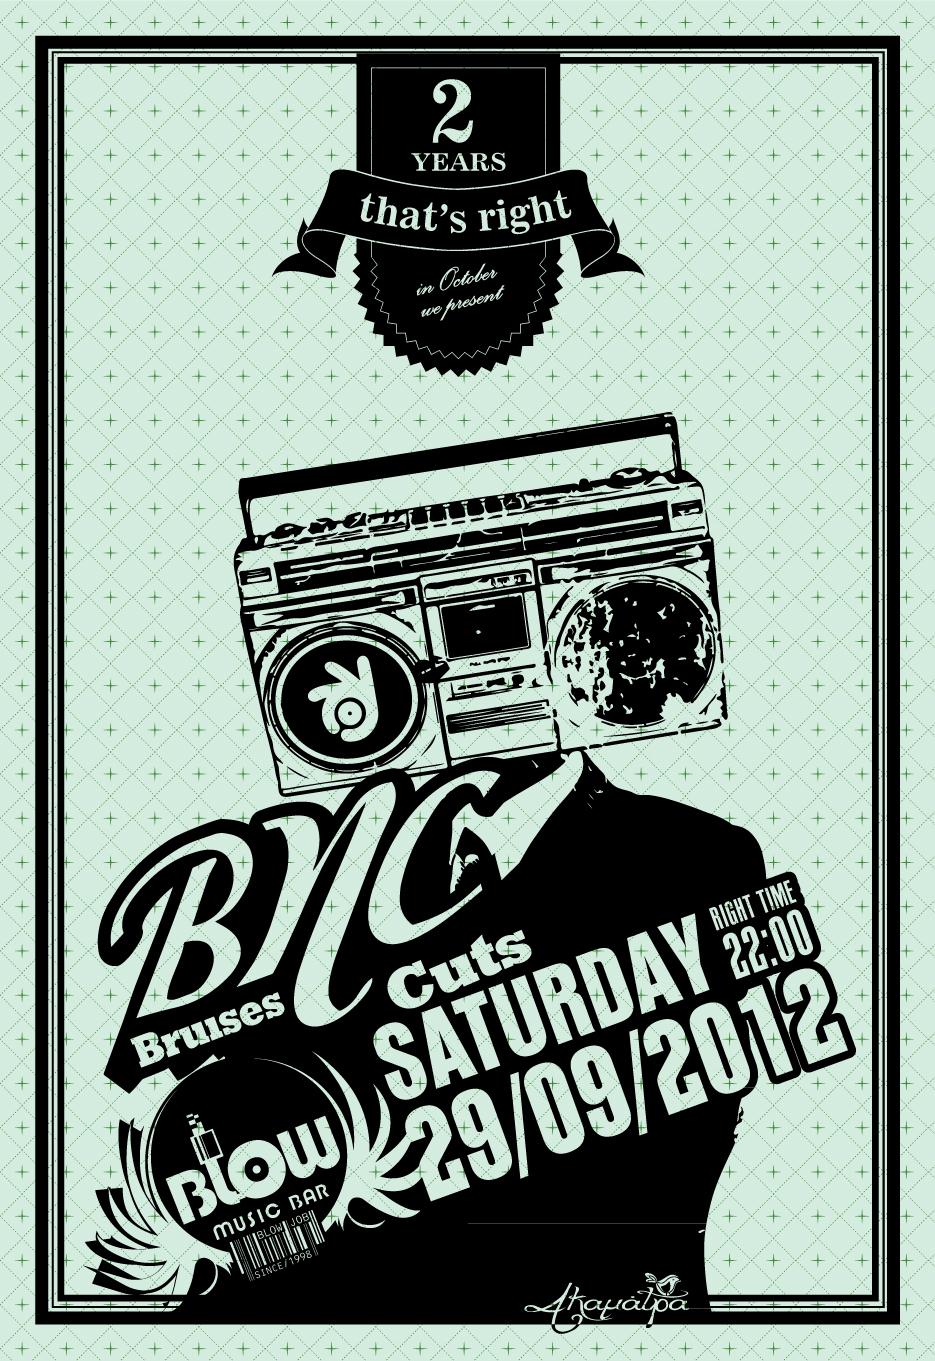 Bnc Blow 2012